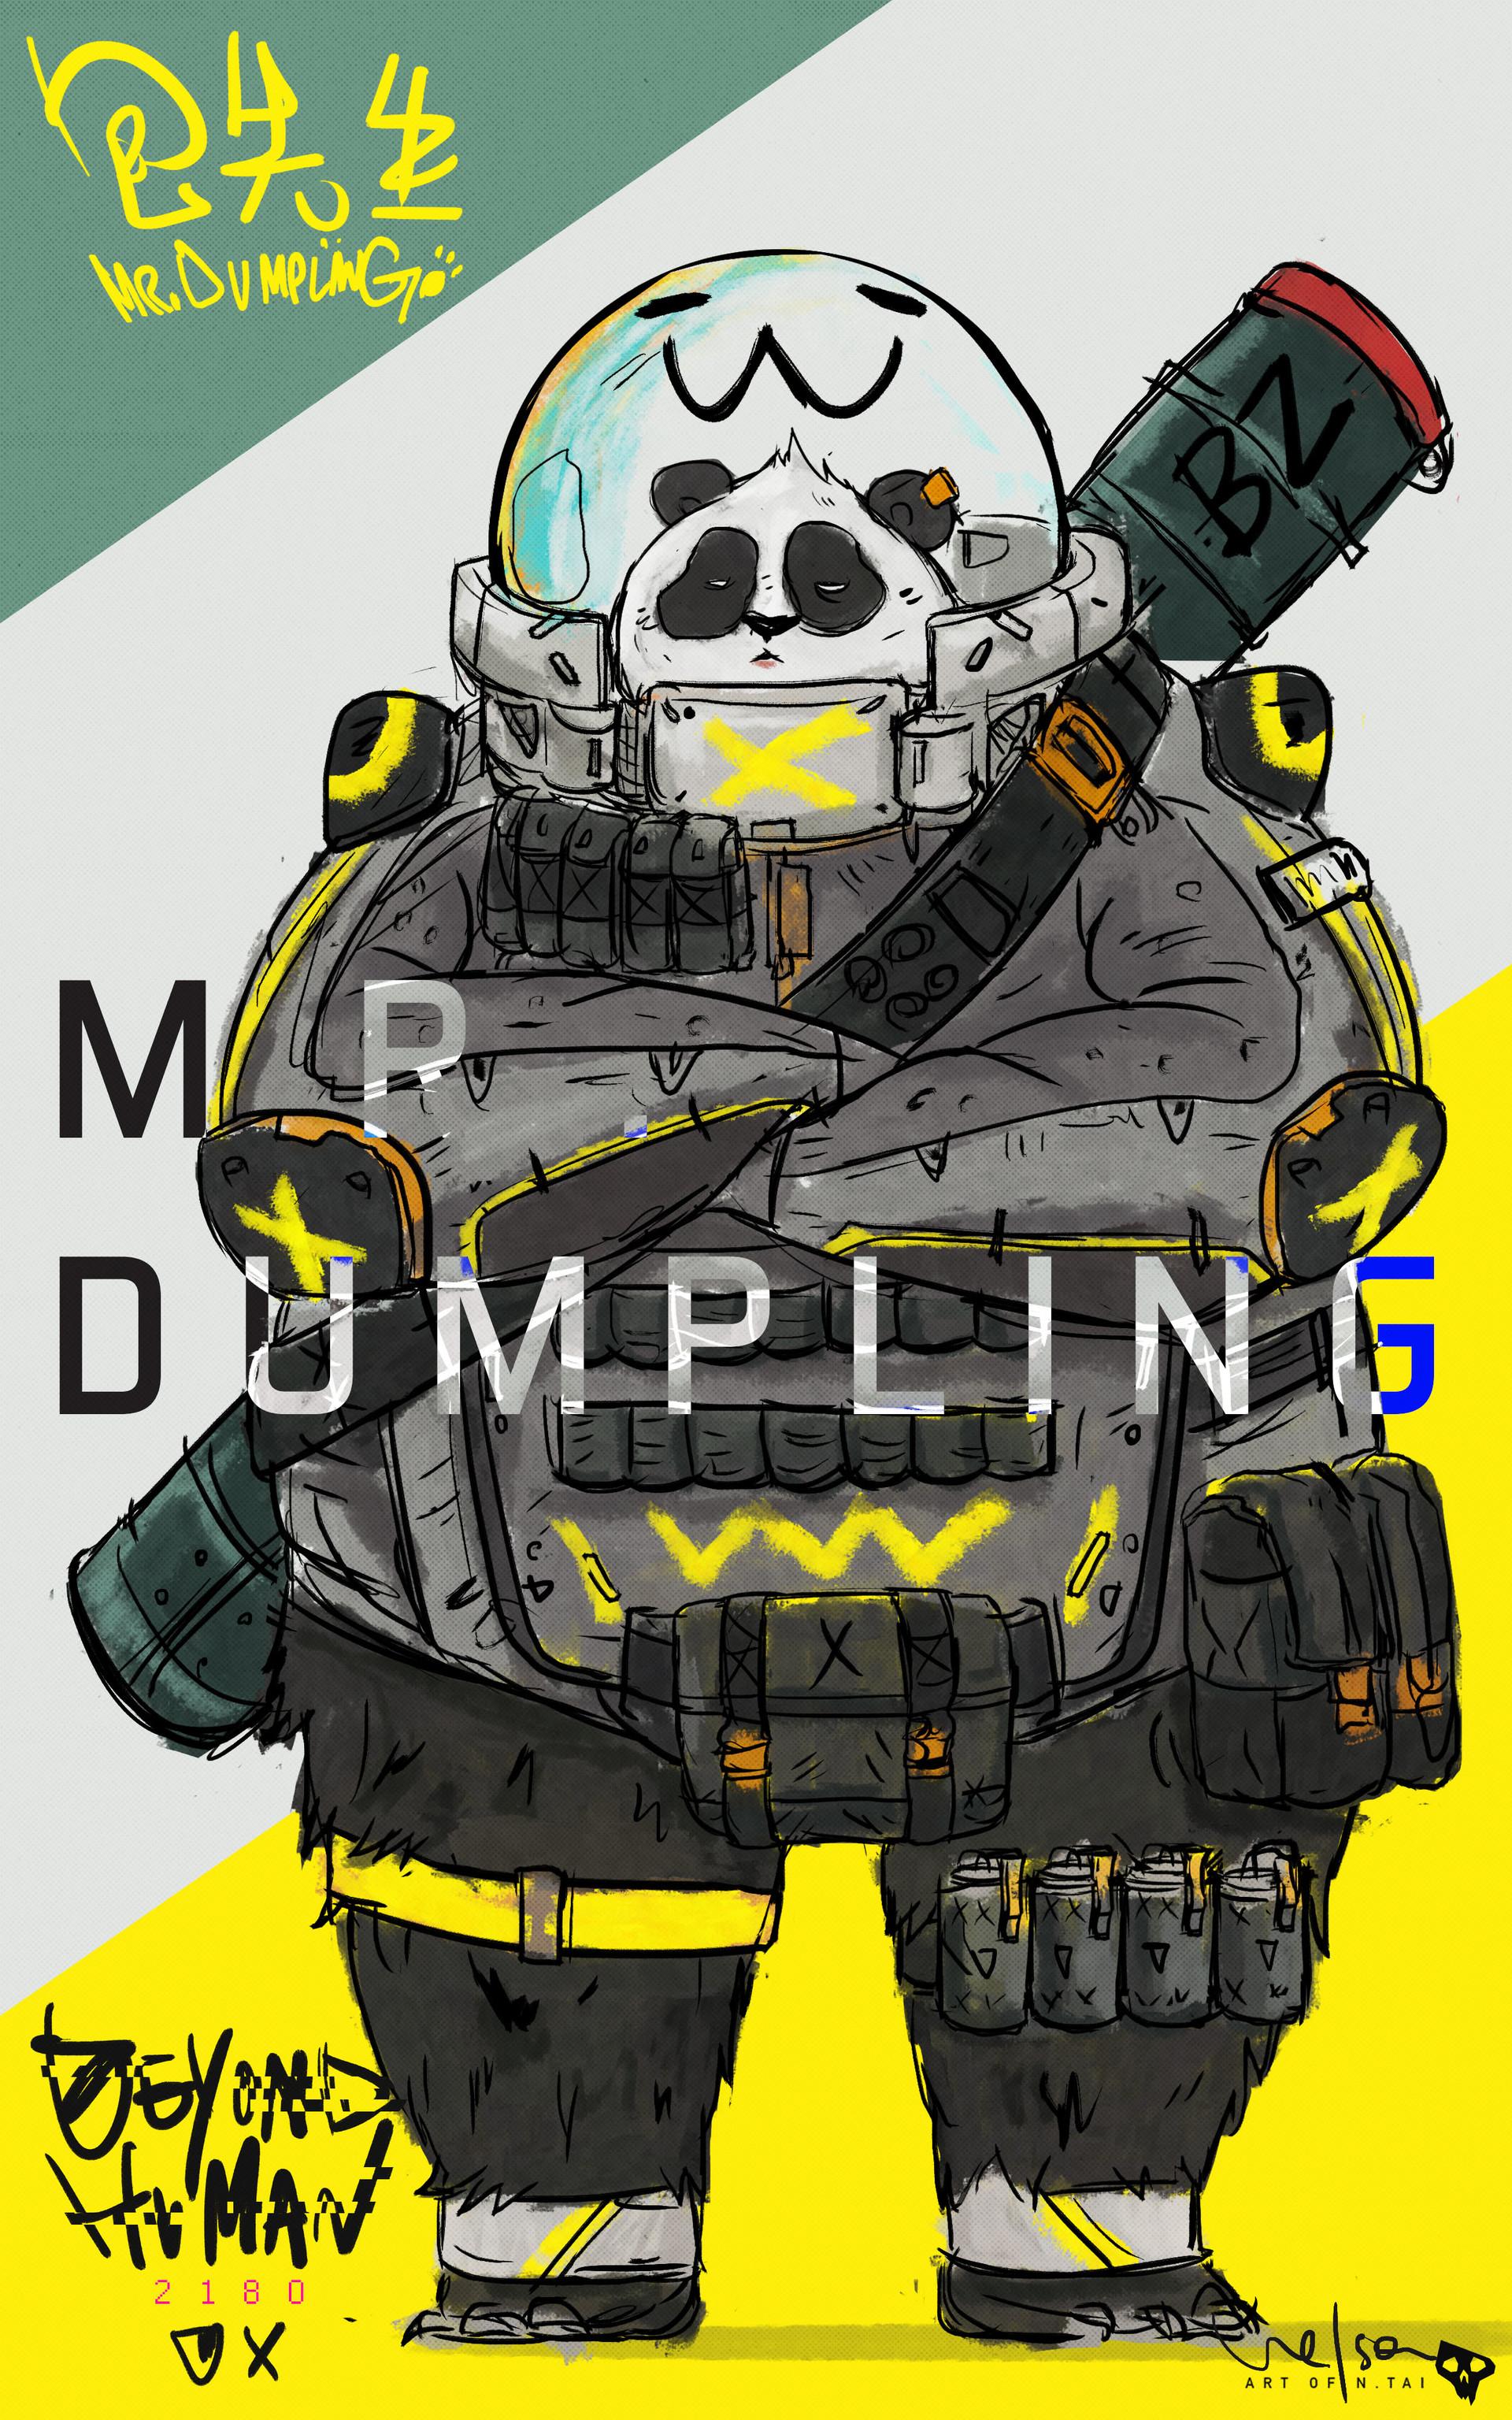 Nelson tai asbh dsgn dumpling 001a